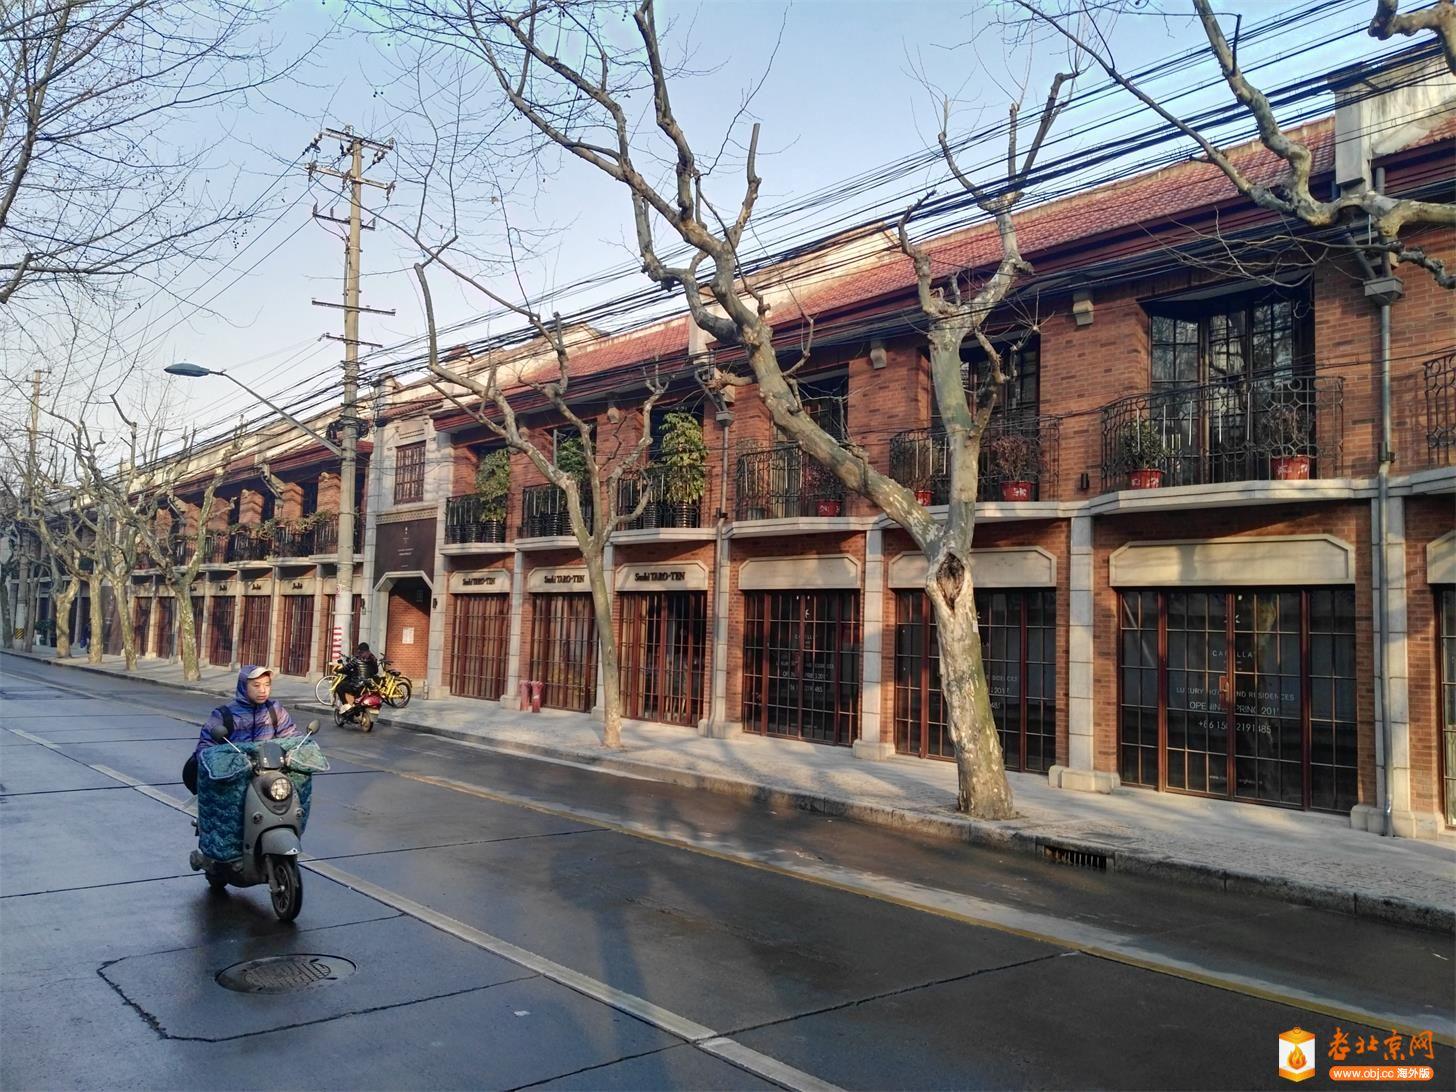 RE: 旧时京城里的沪上风情-新市区泰安里